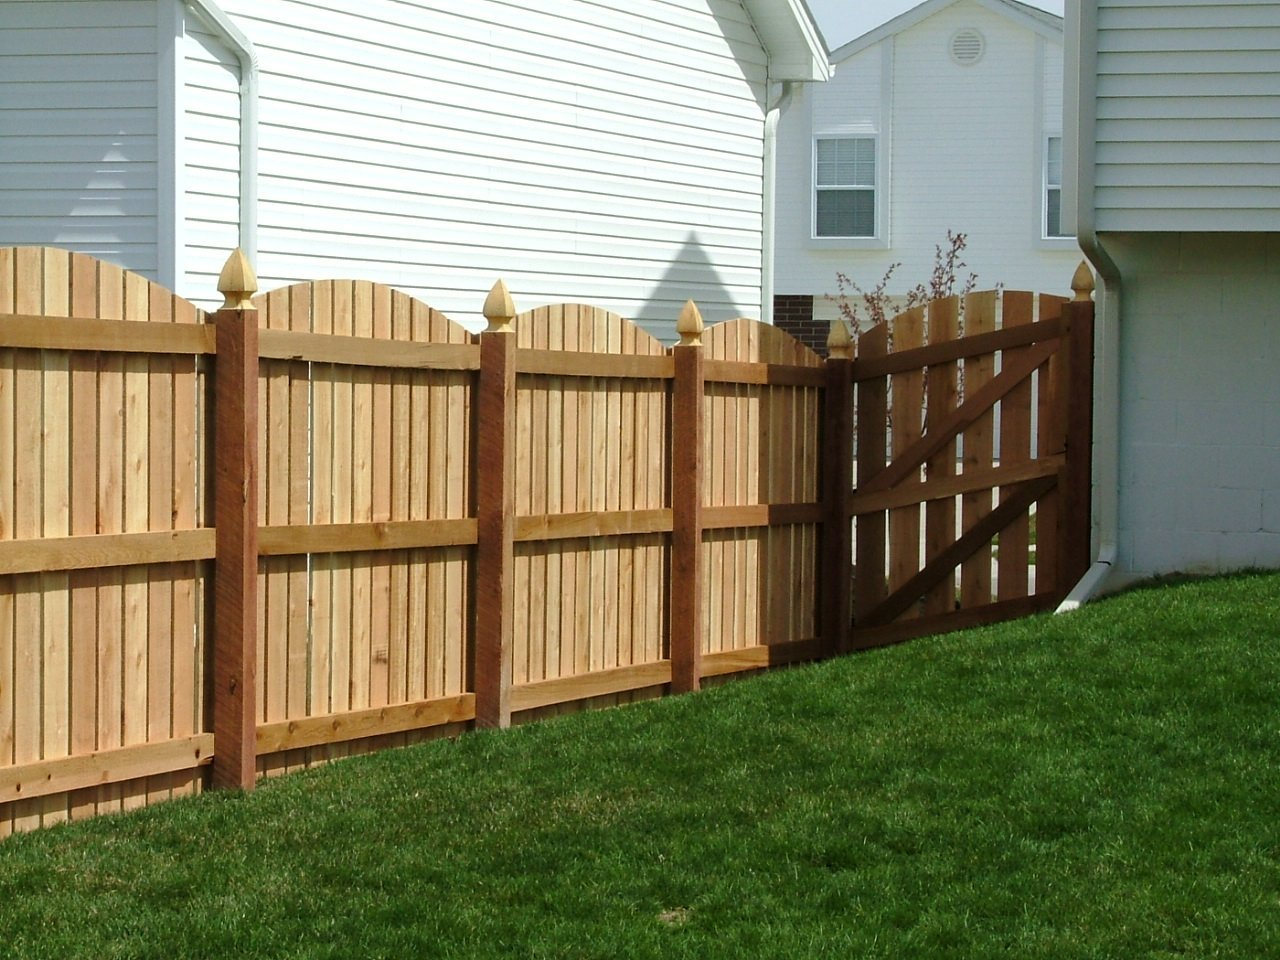 Dakota Fence & Deck 6' cedar picket scalloped up with gothic posts - Omaha and Papillion, Nebraska